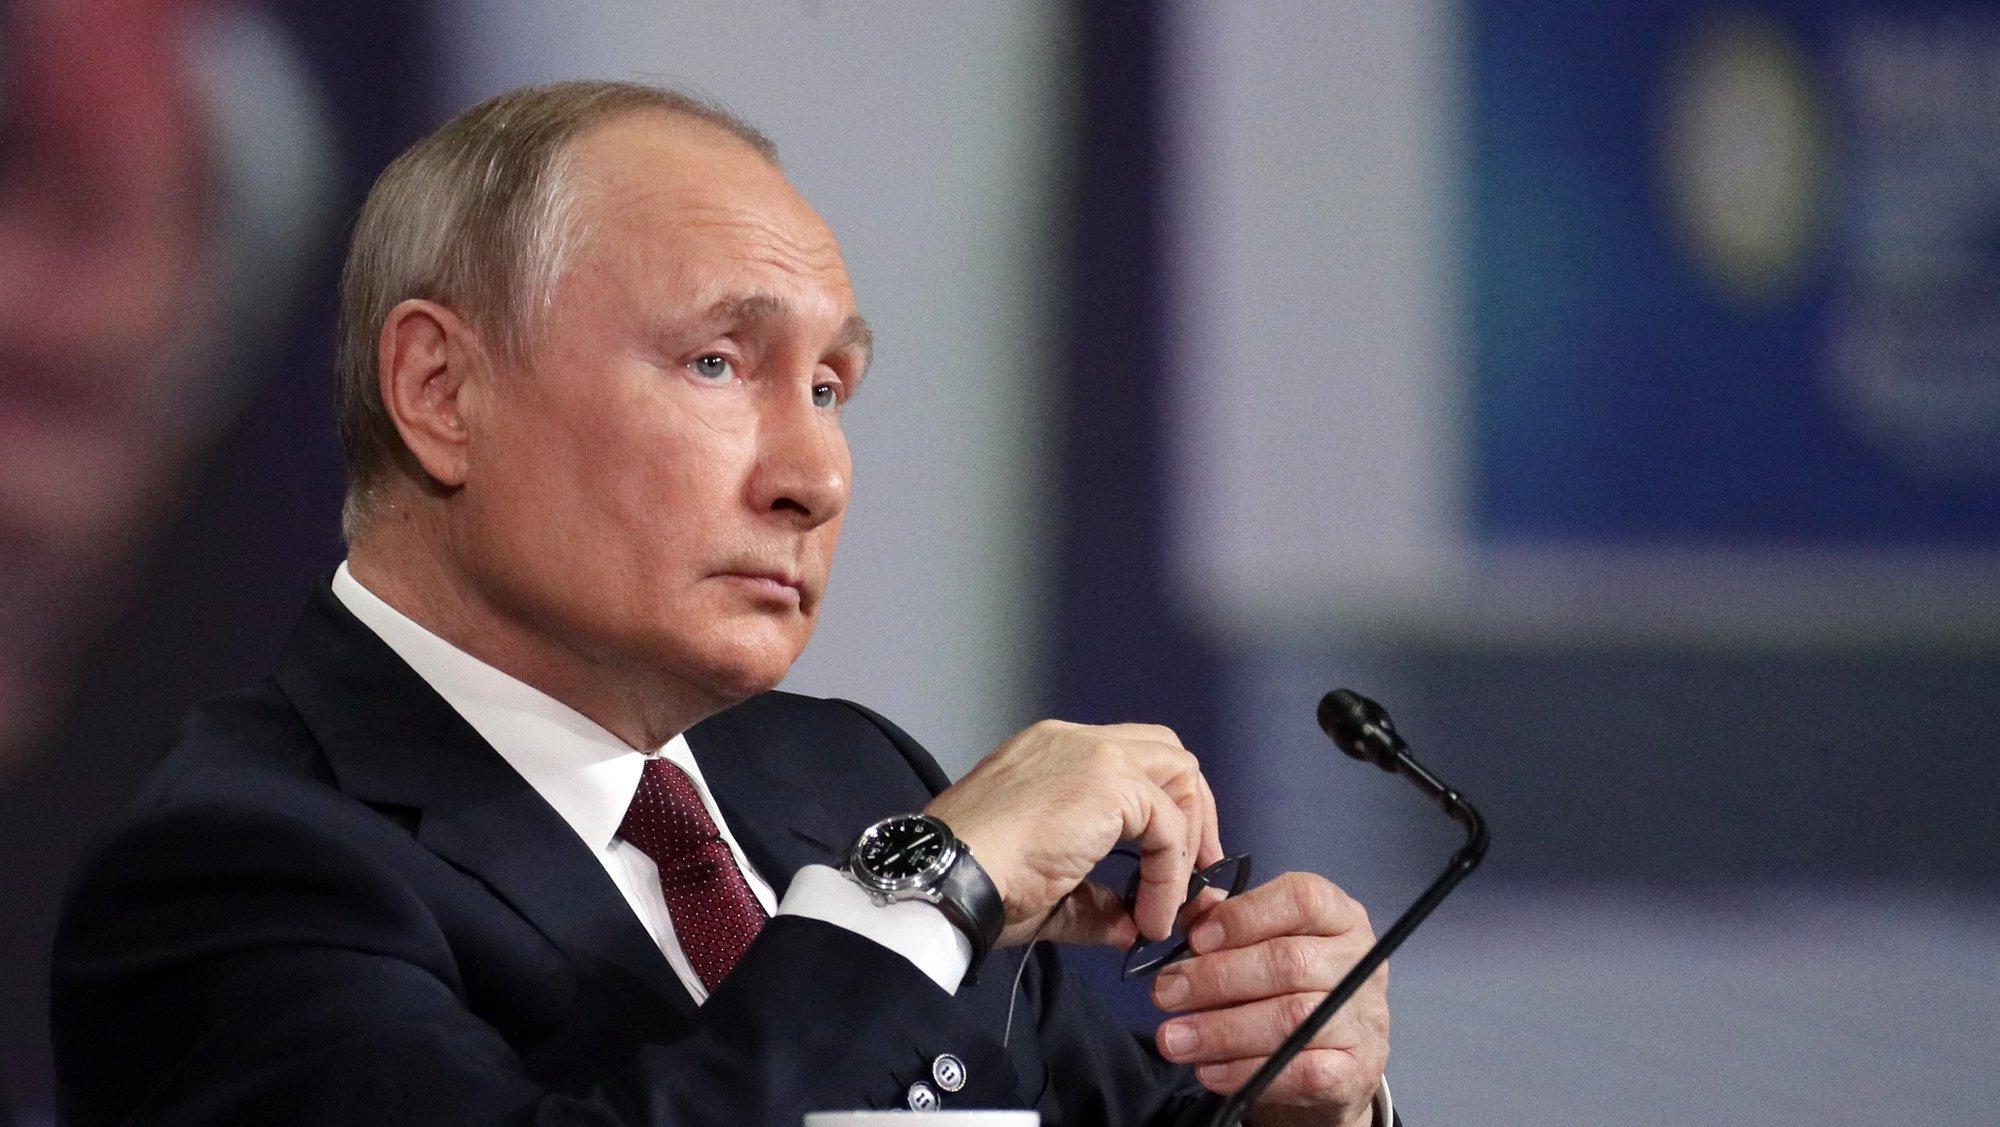 epa09247822 Russian President Vladimir Putin attends a plenary session of the St. Petersburg International Economic Forum (SPIEF) in St. Petersburg, Russia, 04 June 2021. The 24th St.Petersburg International Economic Forum runs from 02 to 05 June 2021.  EPA/VLADIMIR SMIRNOV/SPUTNIK/KREMLIN POOL